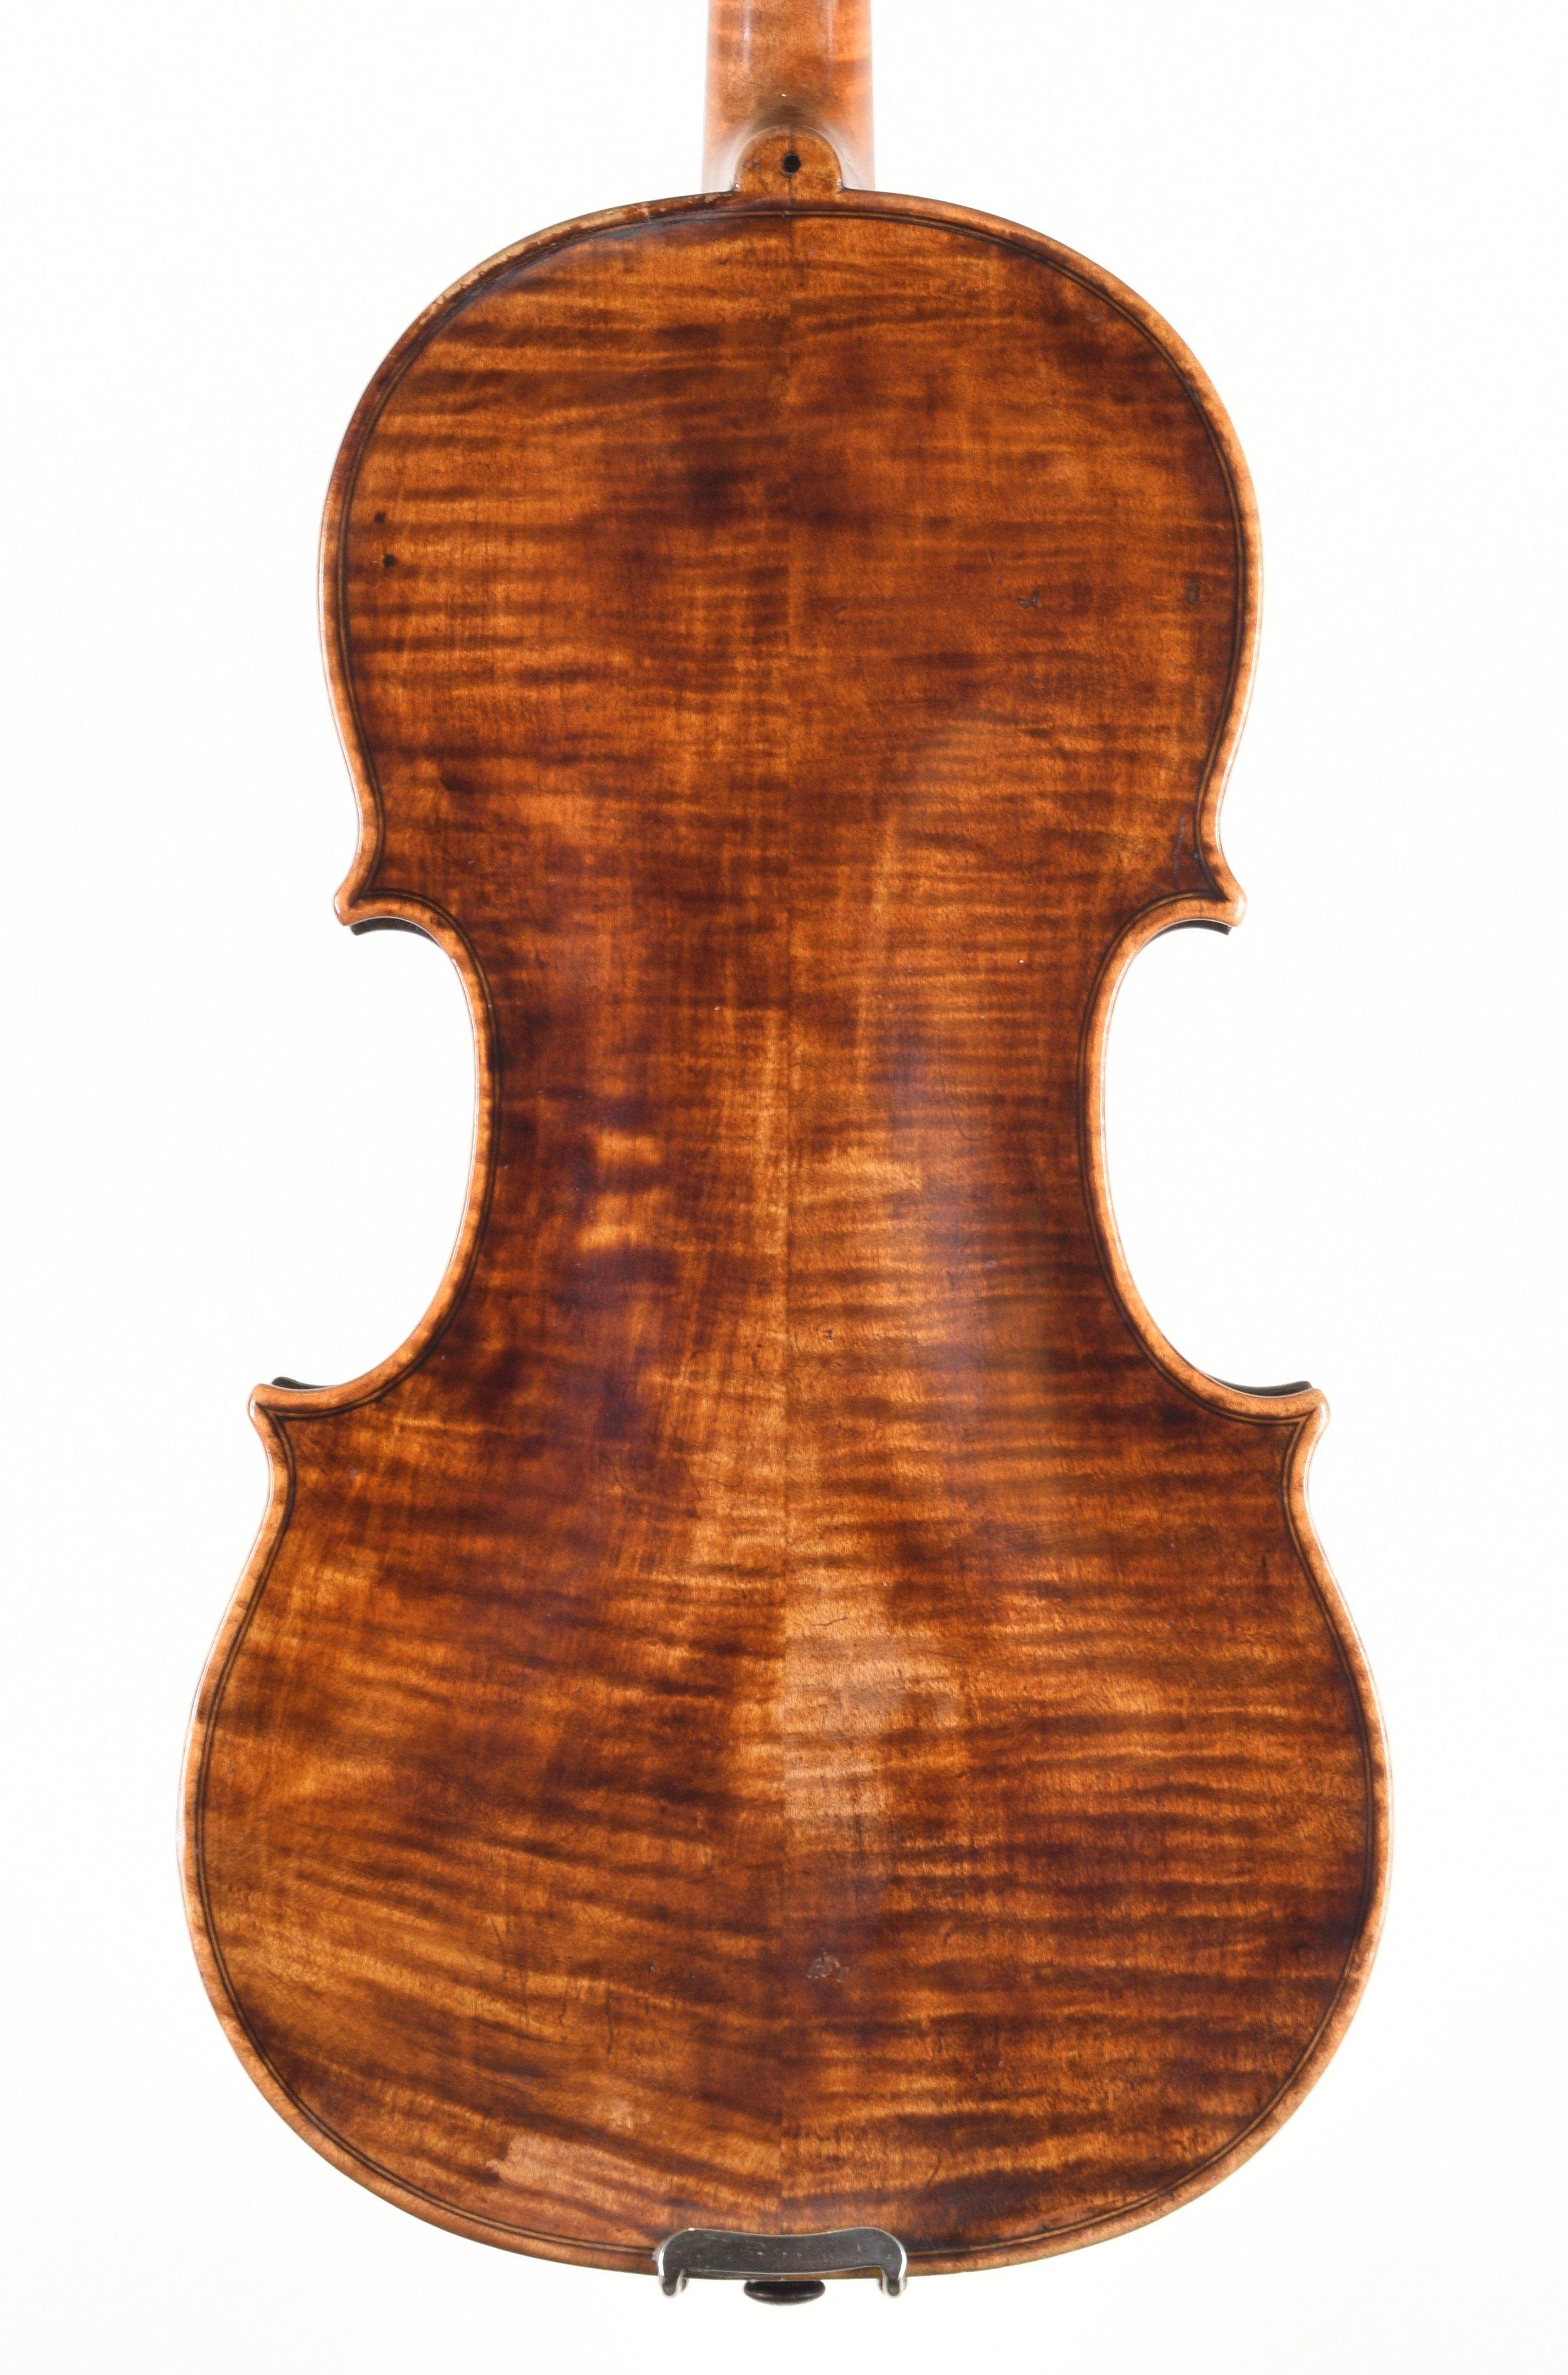 Joseph Hill violin, London, England